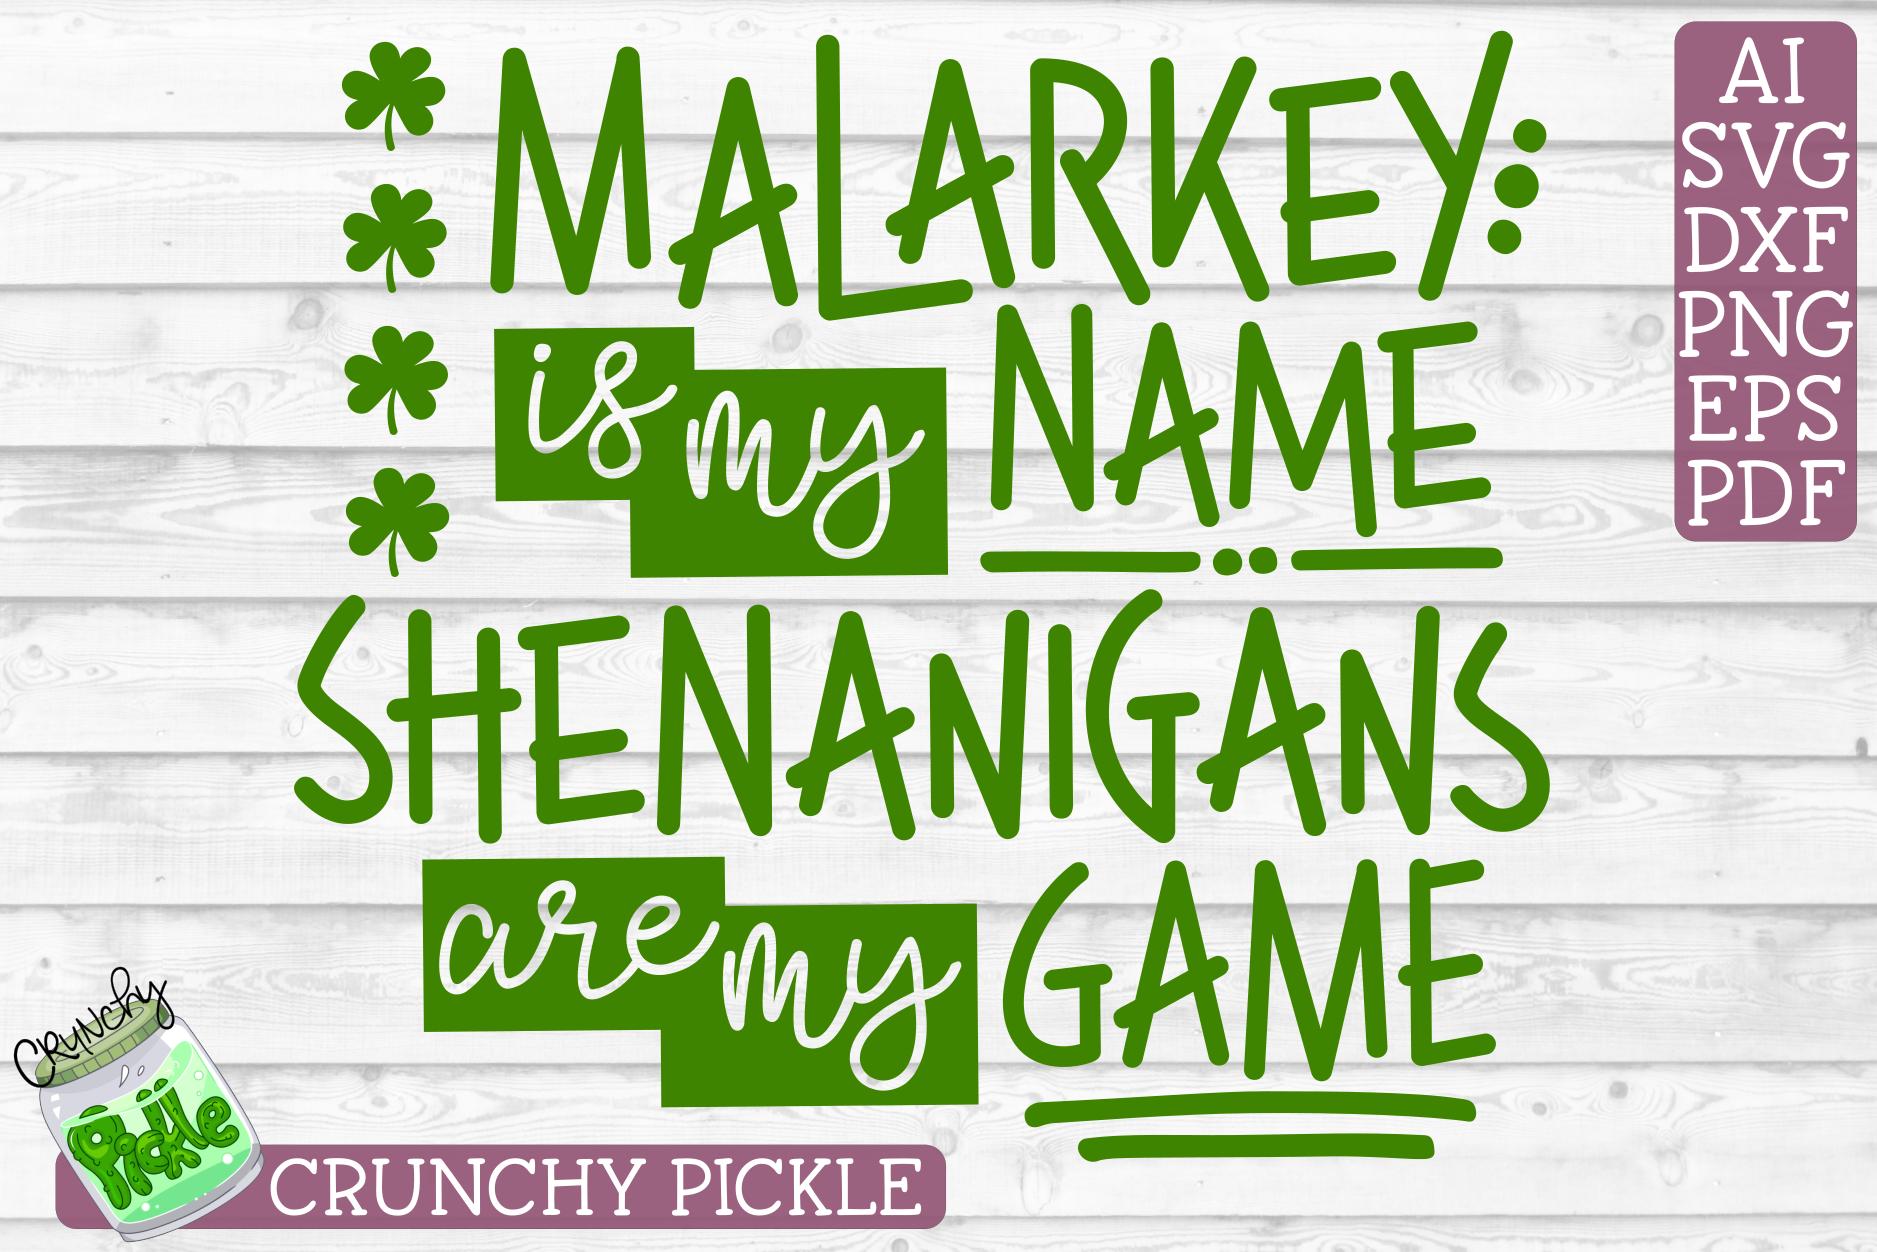 Malarkey Name, Shenanigans Game St Patick's Day SVG Cut File example image 2